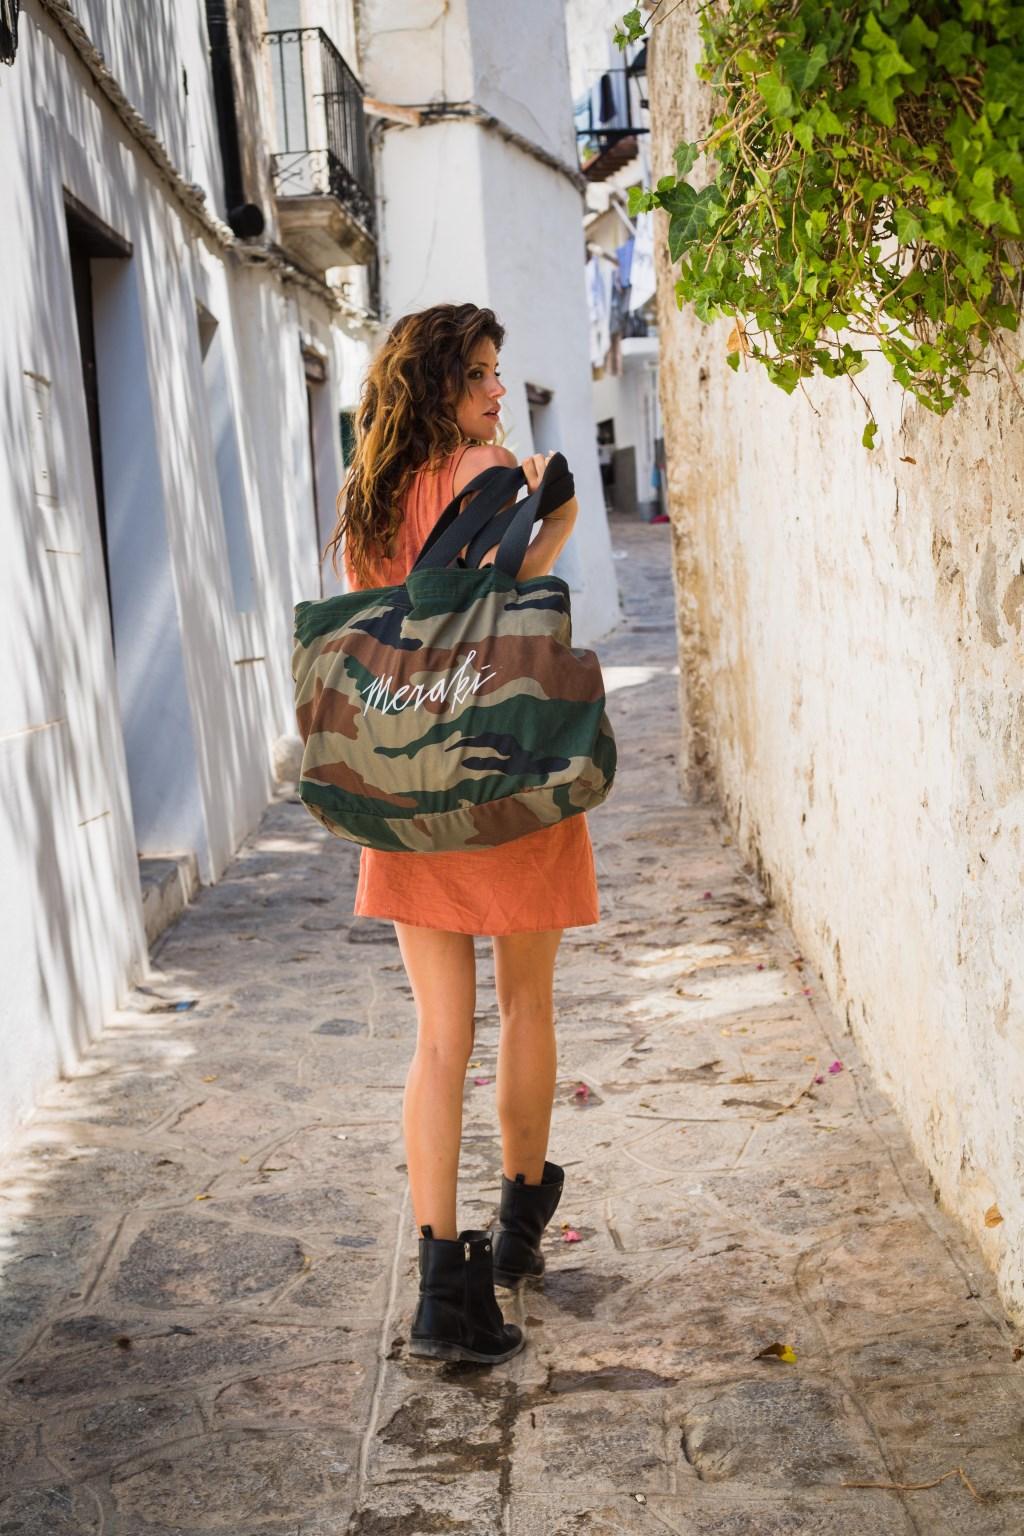 Model Soraya Cruz met een stoere 'Meraki' tas. (Foto: Carola Doornbos) Foto: Carola Doornbos © MooiBoxtel